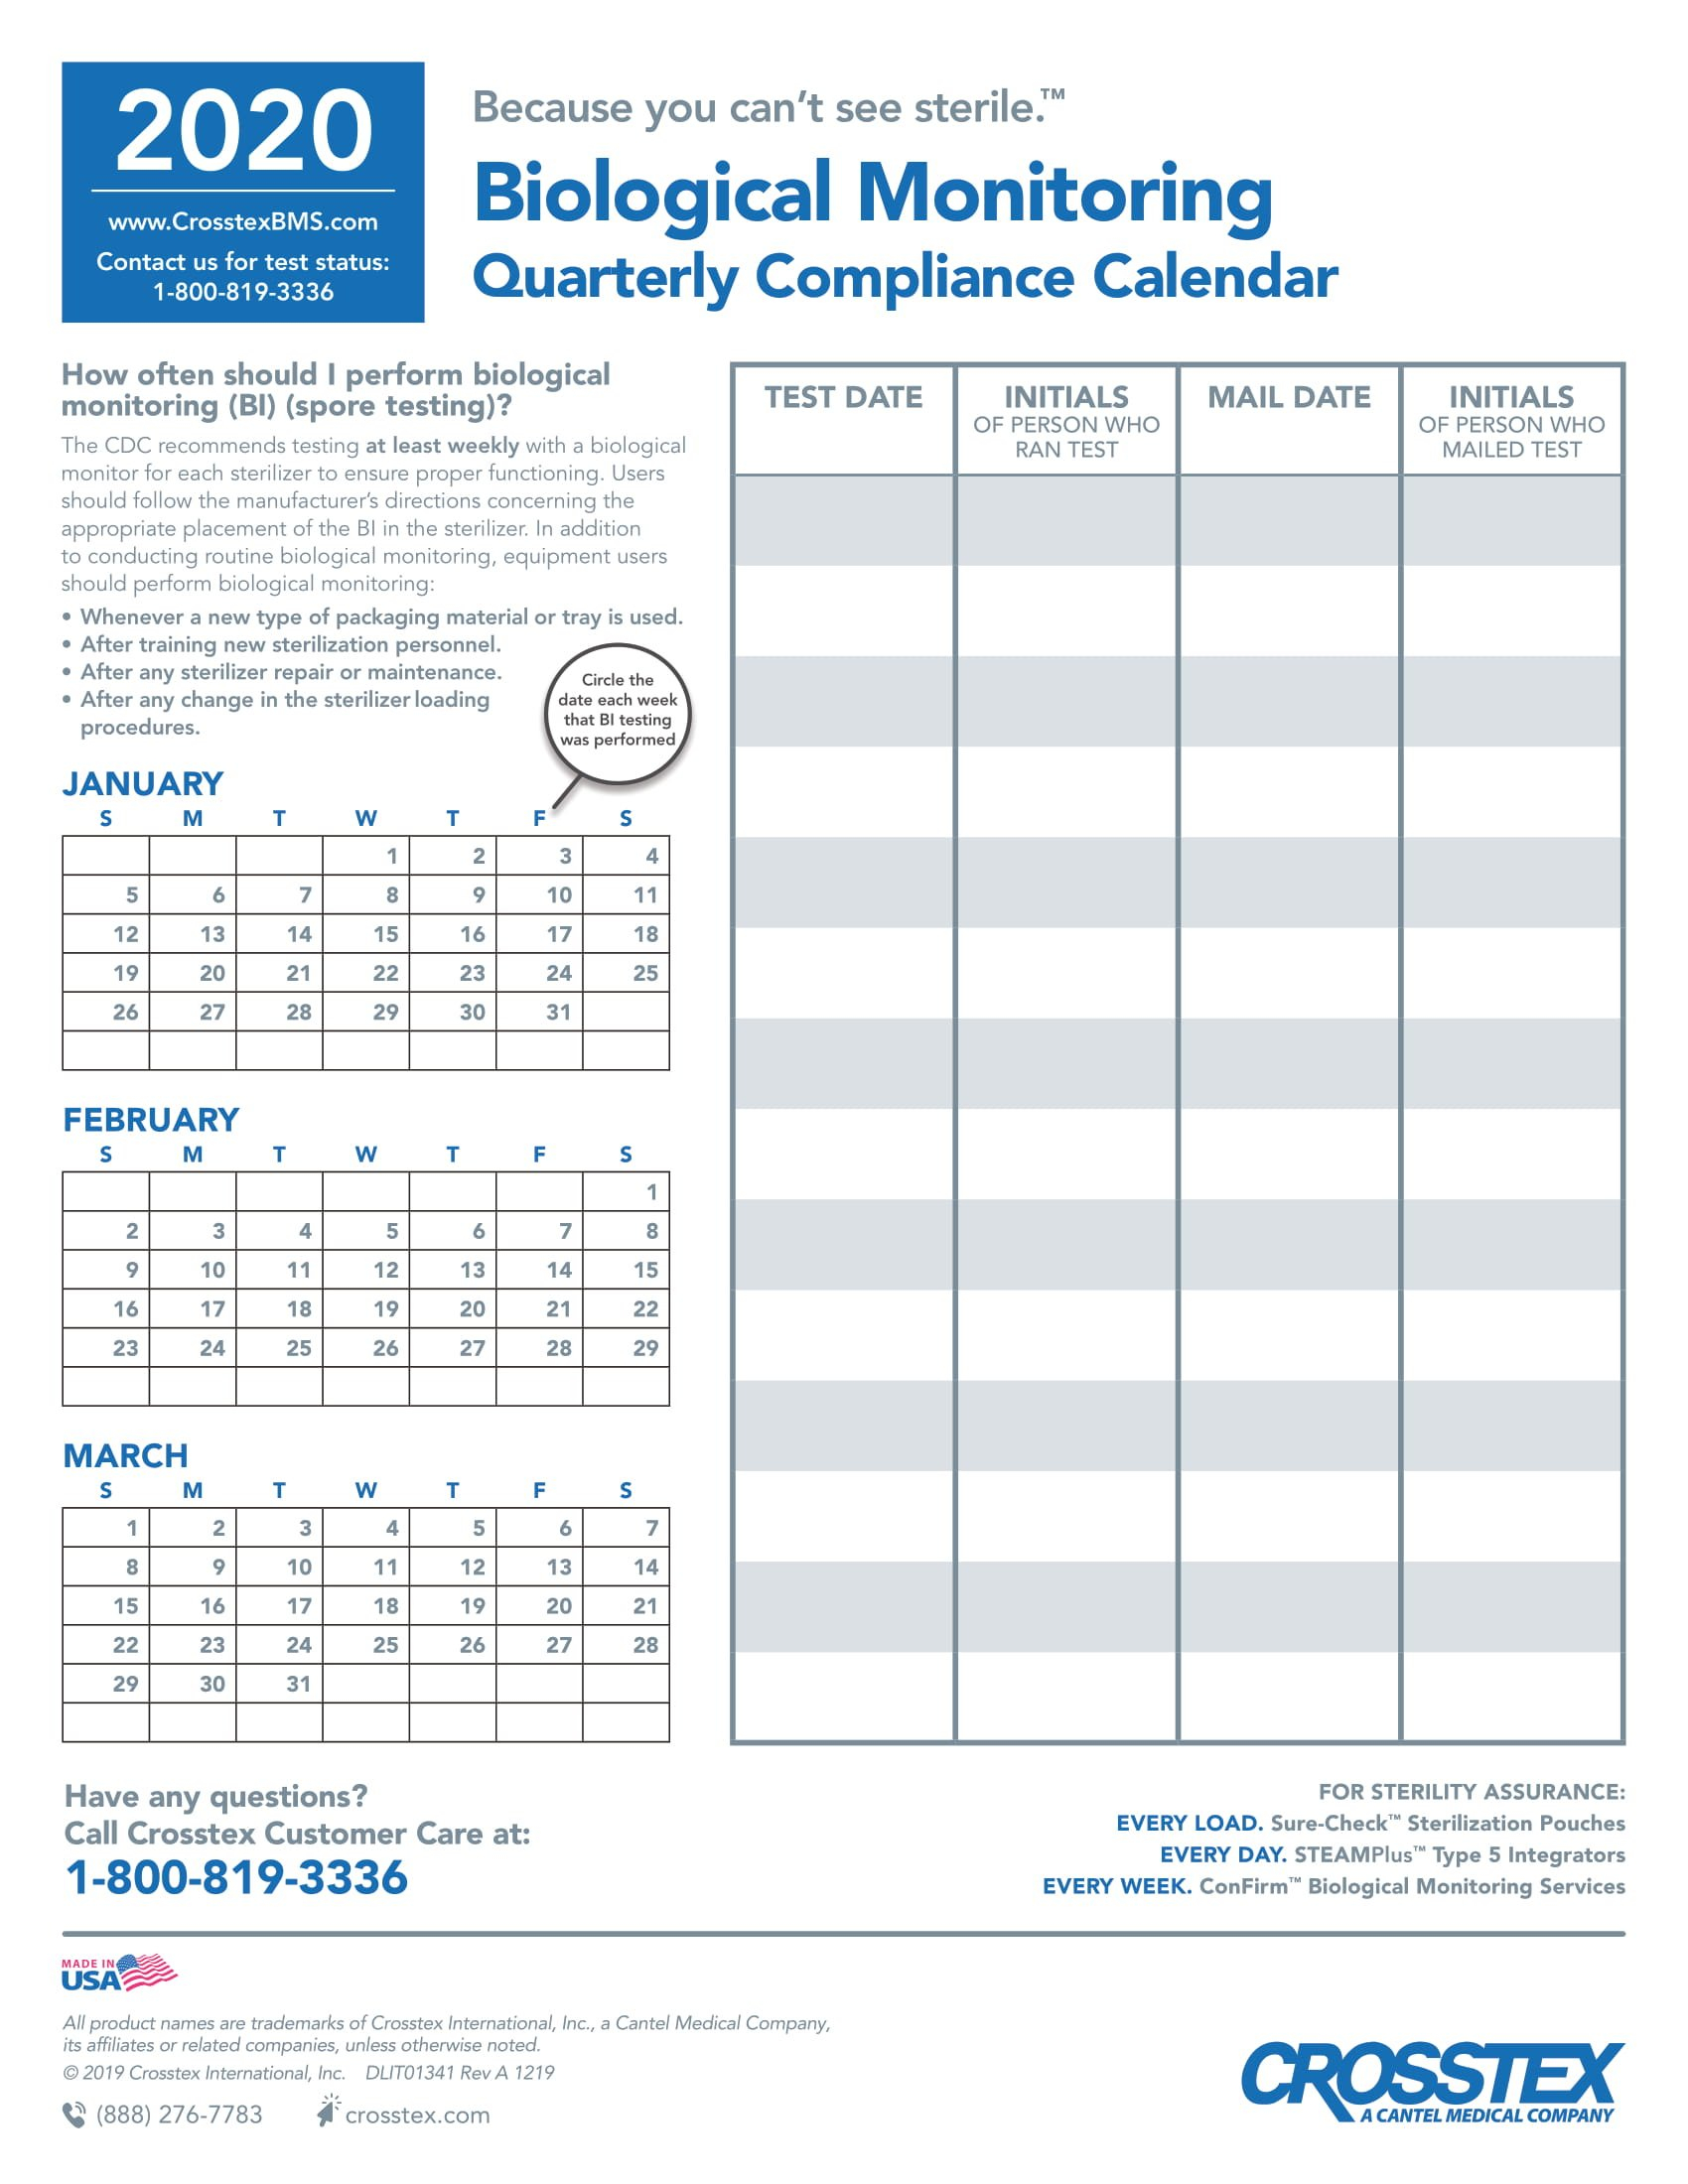 28 Day Vial Expiration Calendar 2020 28 Day Multi Dose Vial Expiration Date